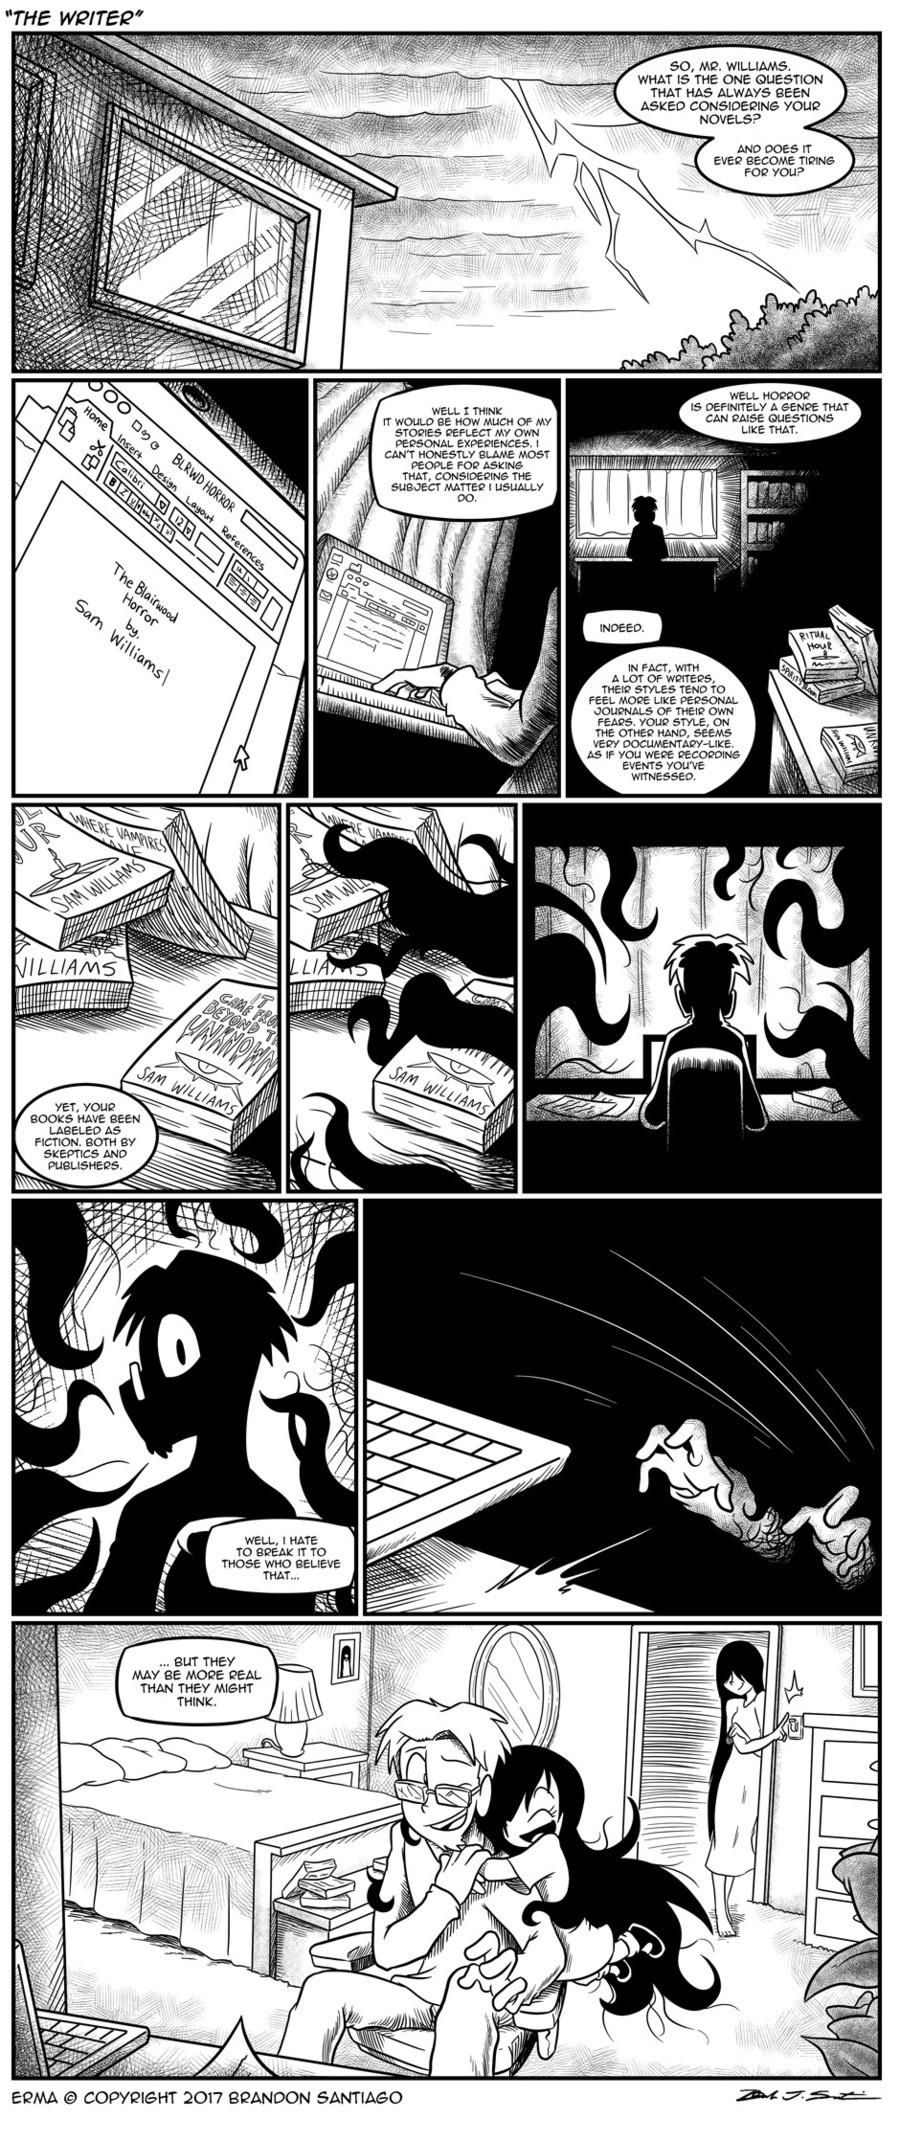 "New Erma comic.. Source: tapas.io/episode/865204 . WHAT Itim THE CINE THM"" HAW ' 5 BEEN ASKED FUN? Al IT warm tte HOW man  erma"